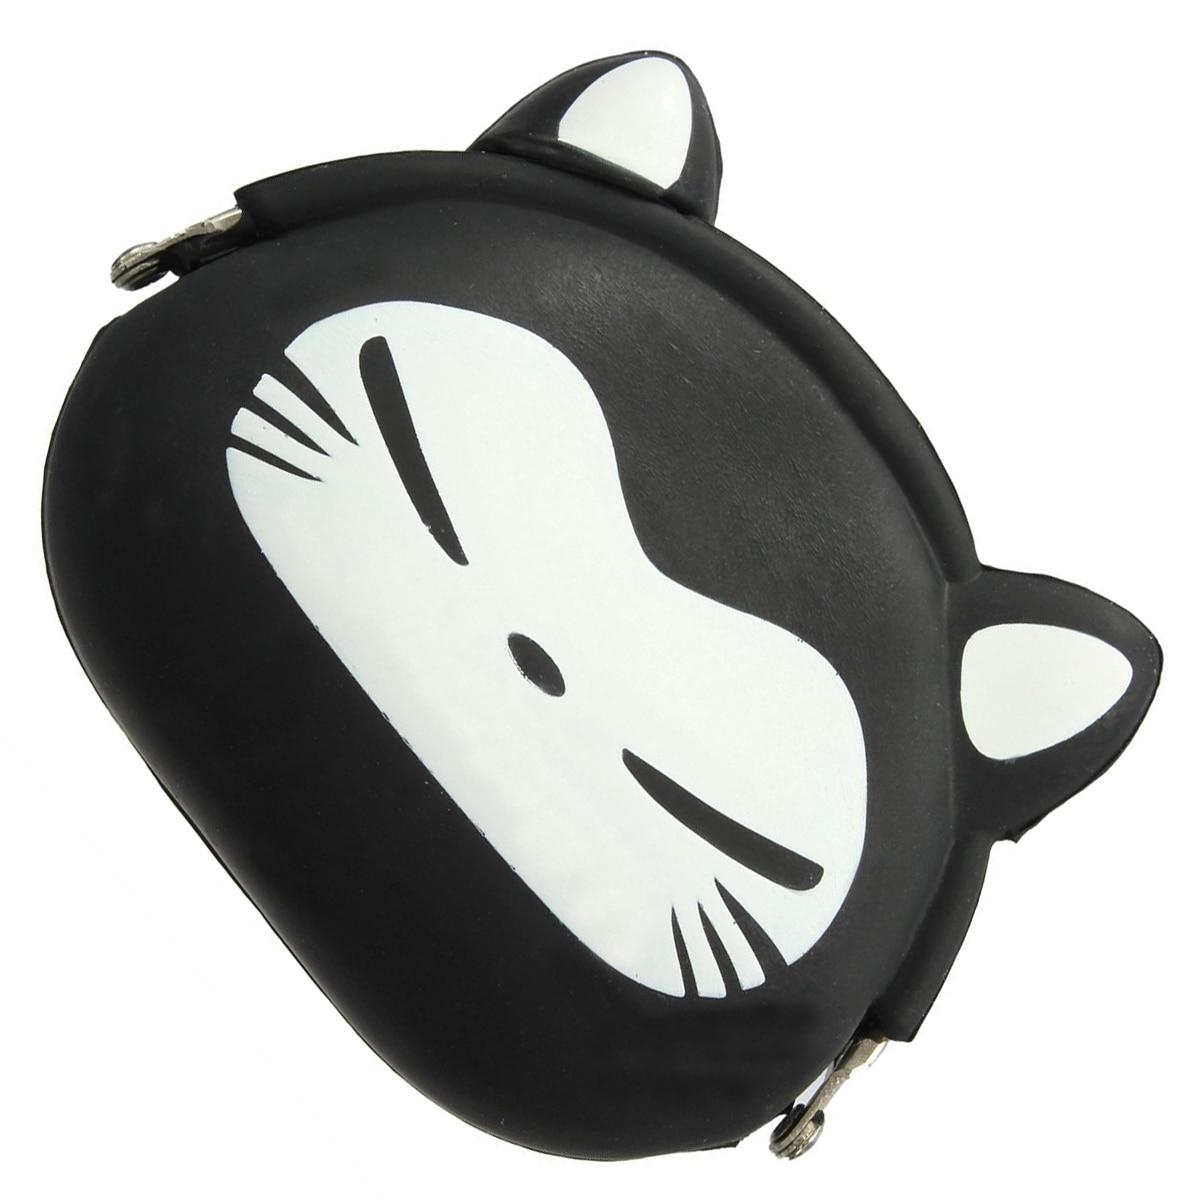 5pcs of Women Girls Wallet Kawaii Cute Cartoon Animal Silicone Jelly Coin Bag Purse Kids Gift Black Fox